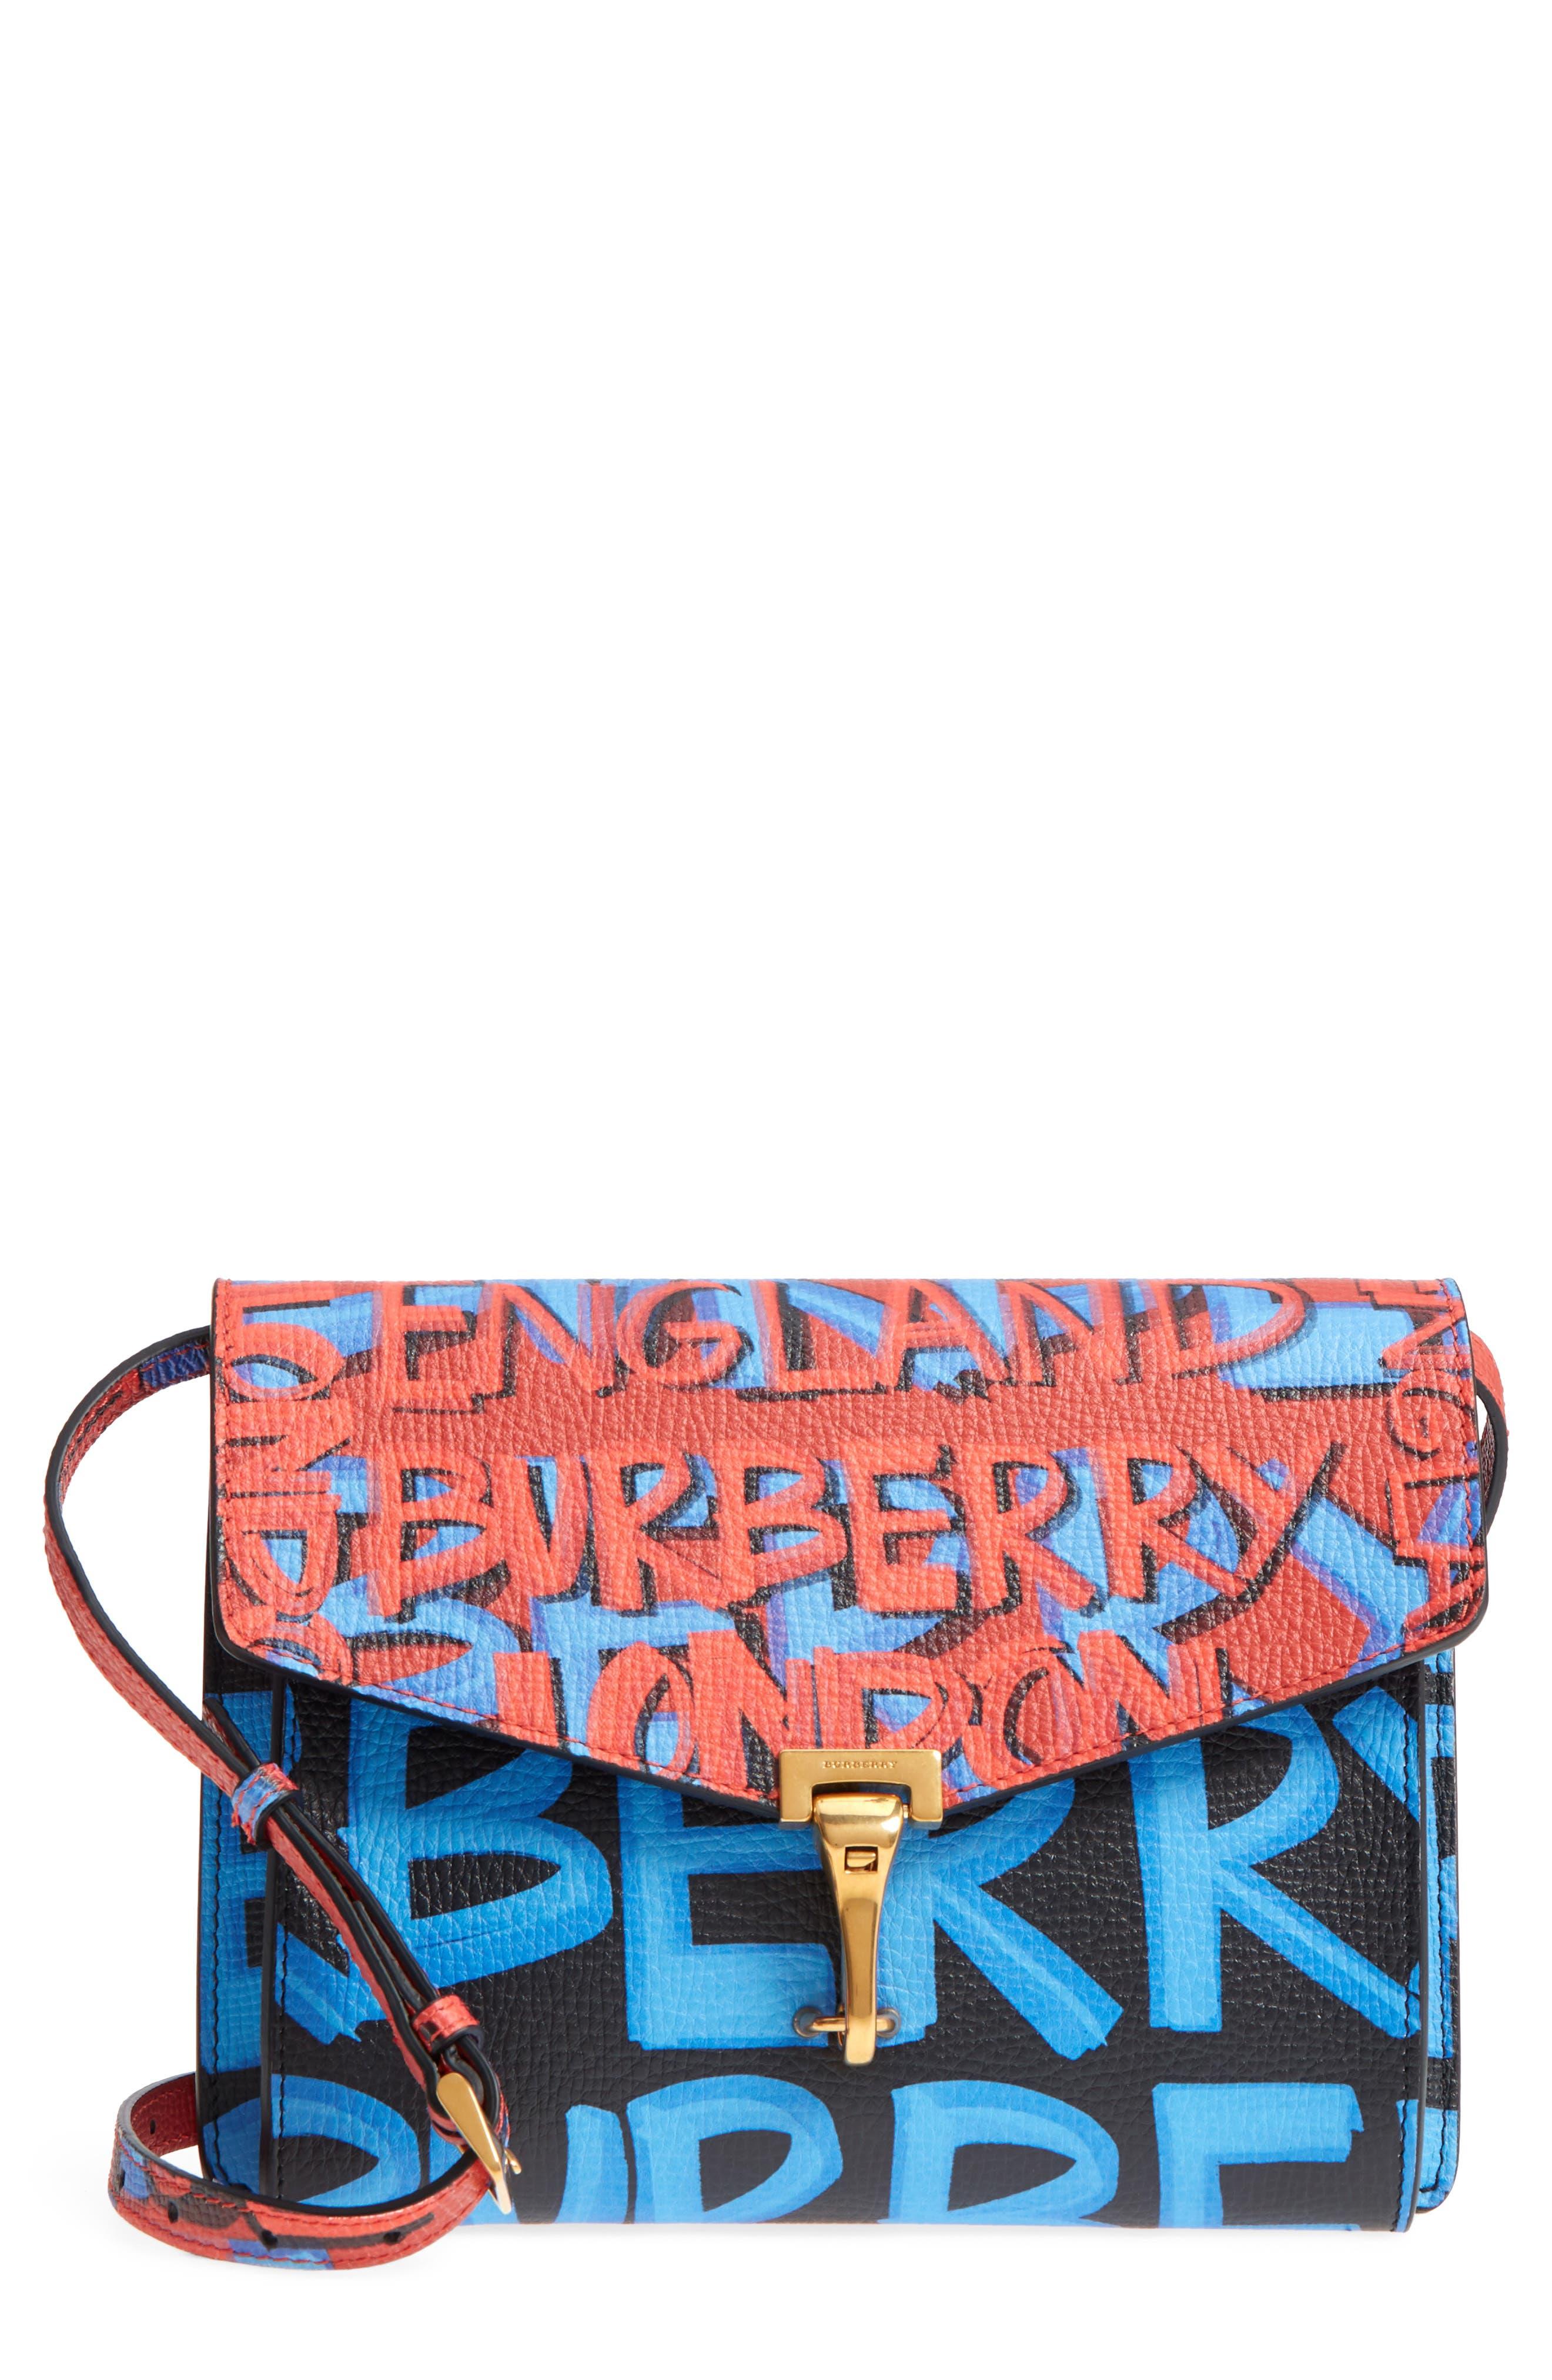 Burberry Small Macken Graffiti Print Leather Crossbody Bag